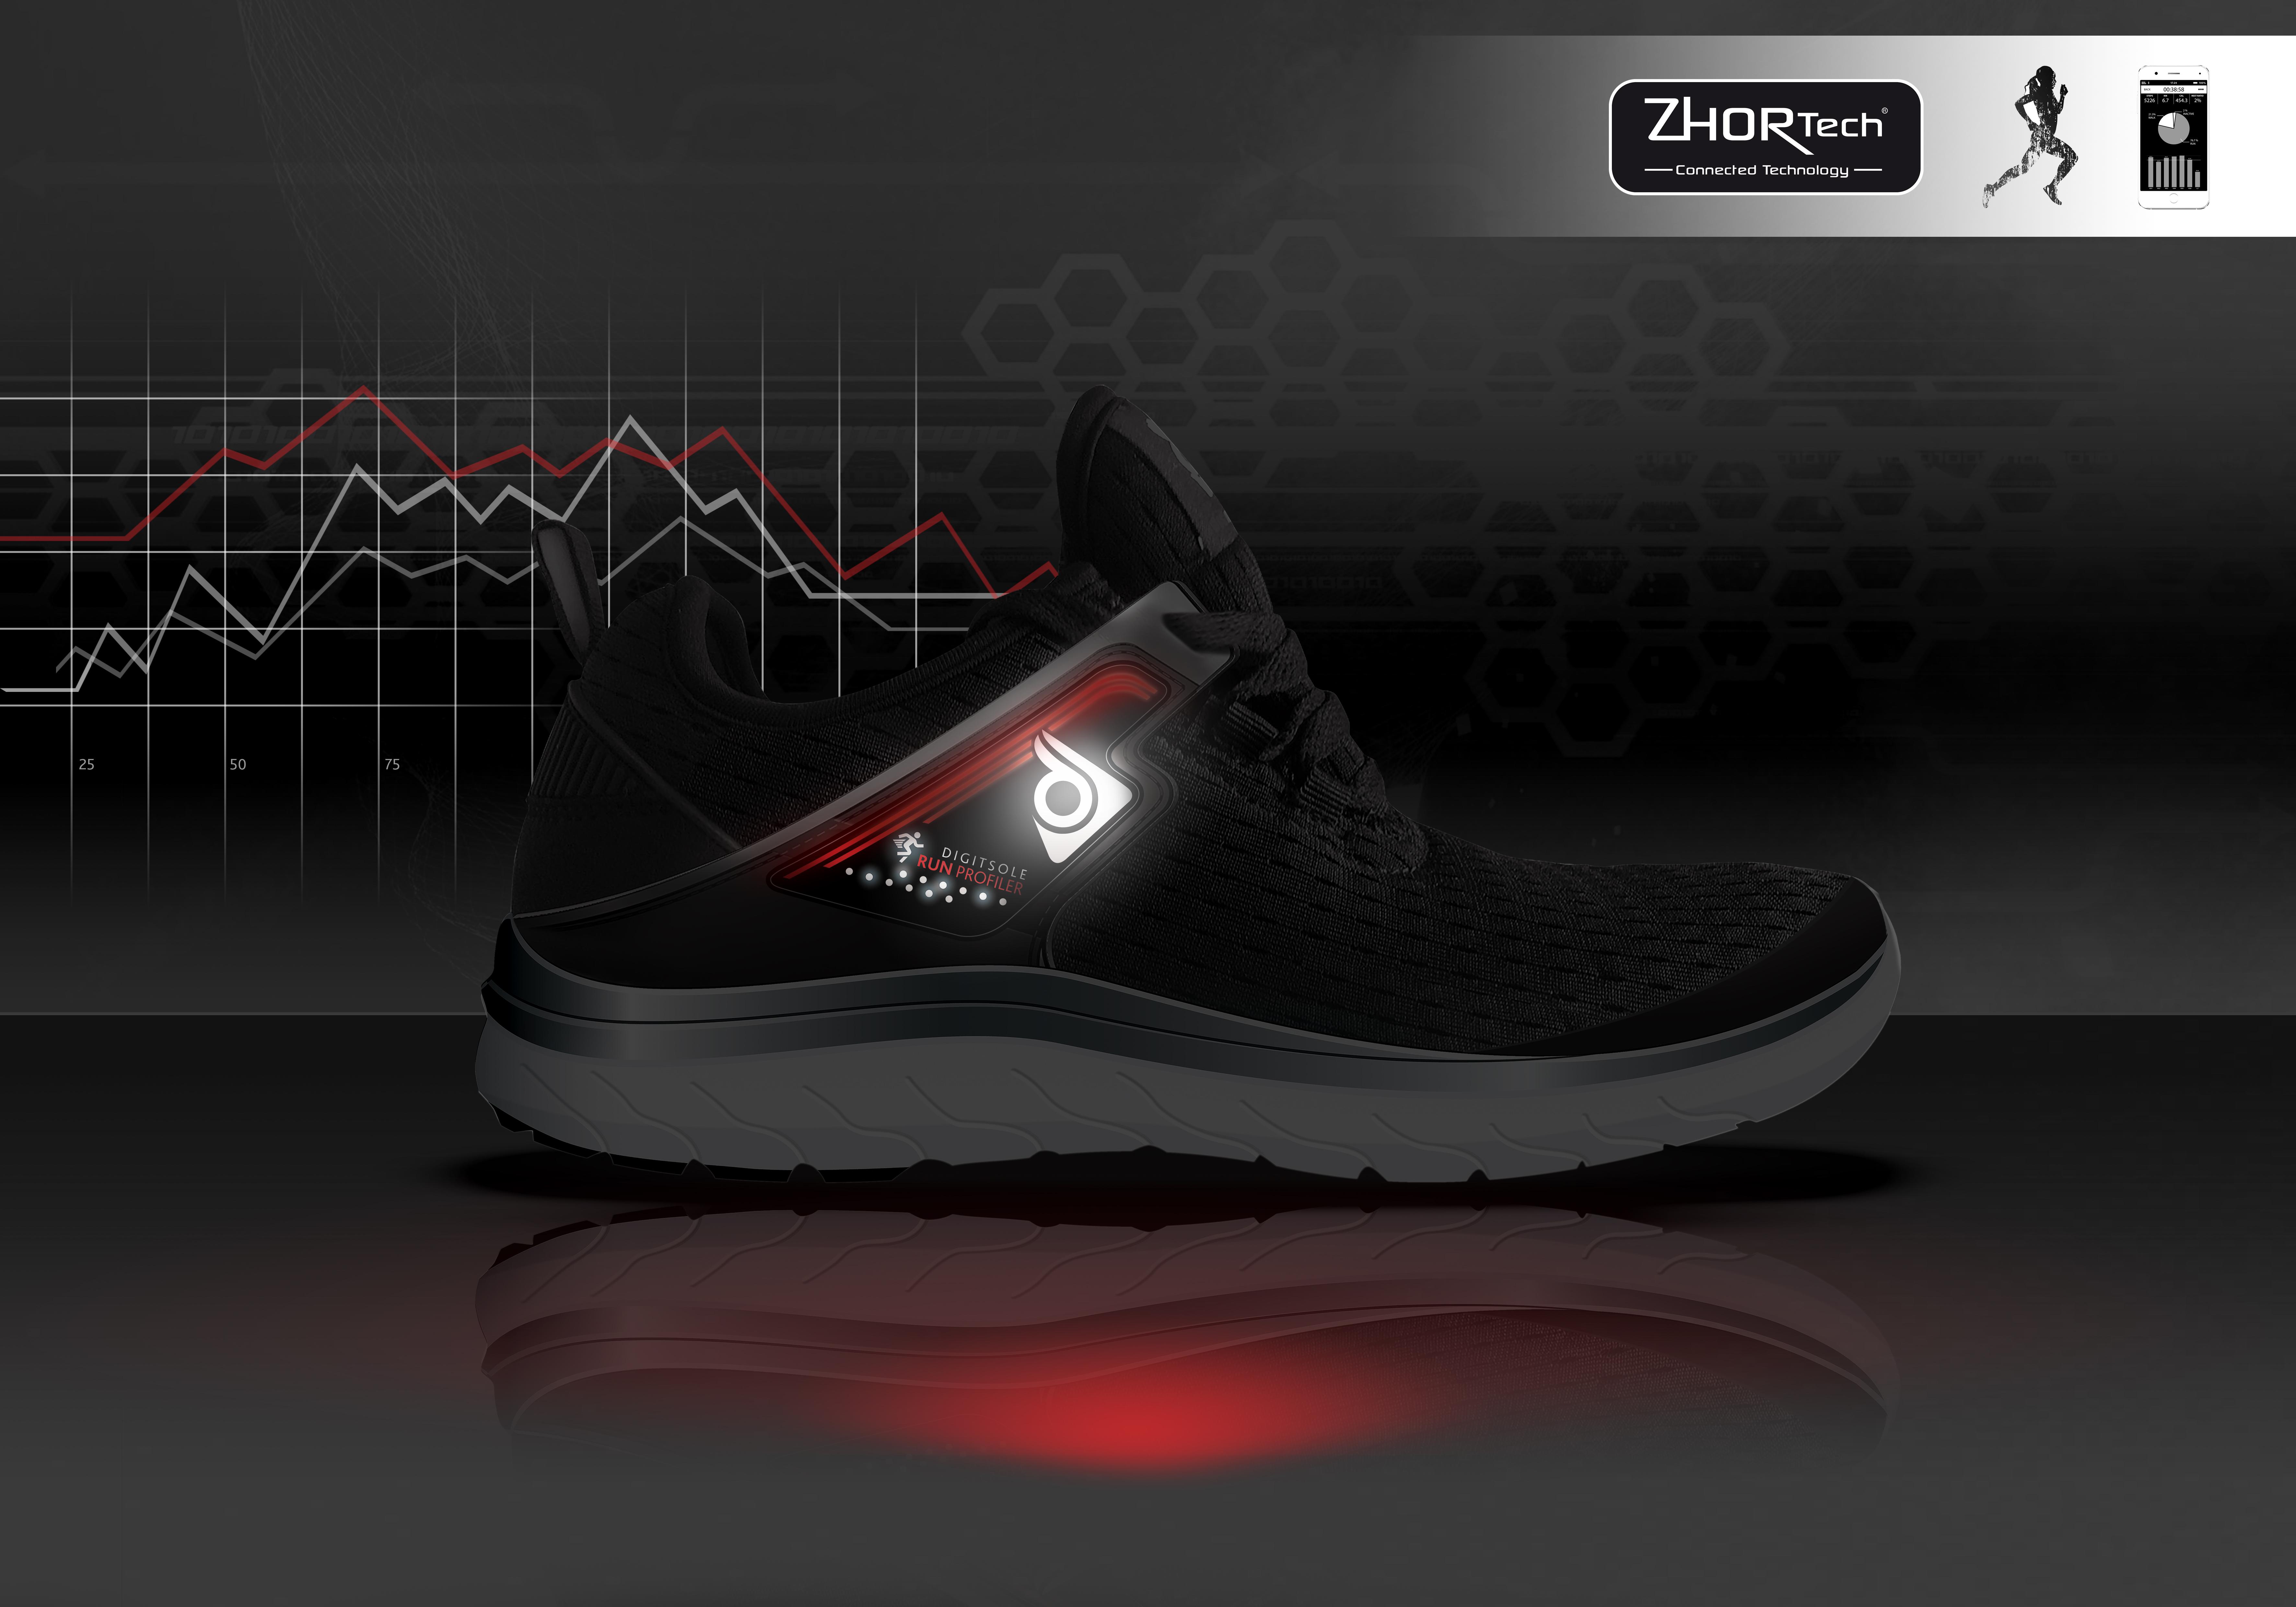 zhortech-shoe-profil-2